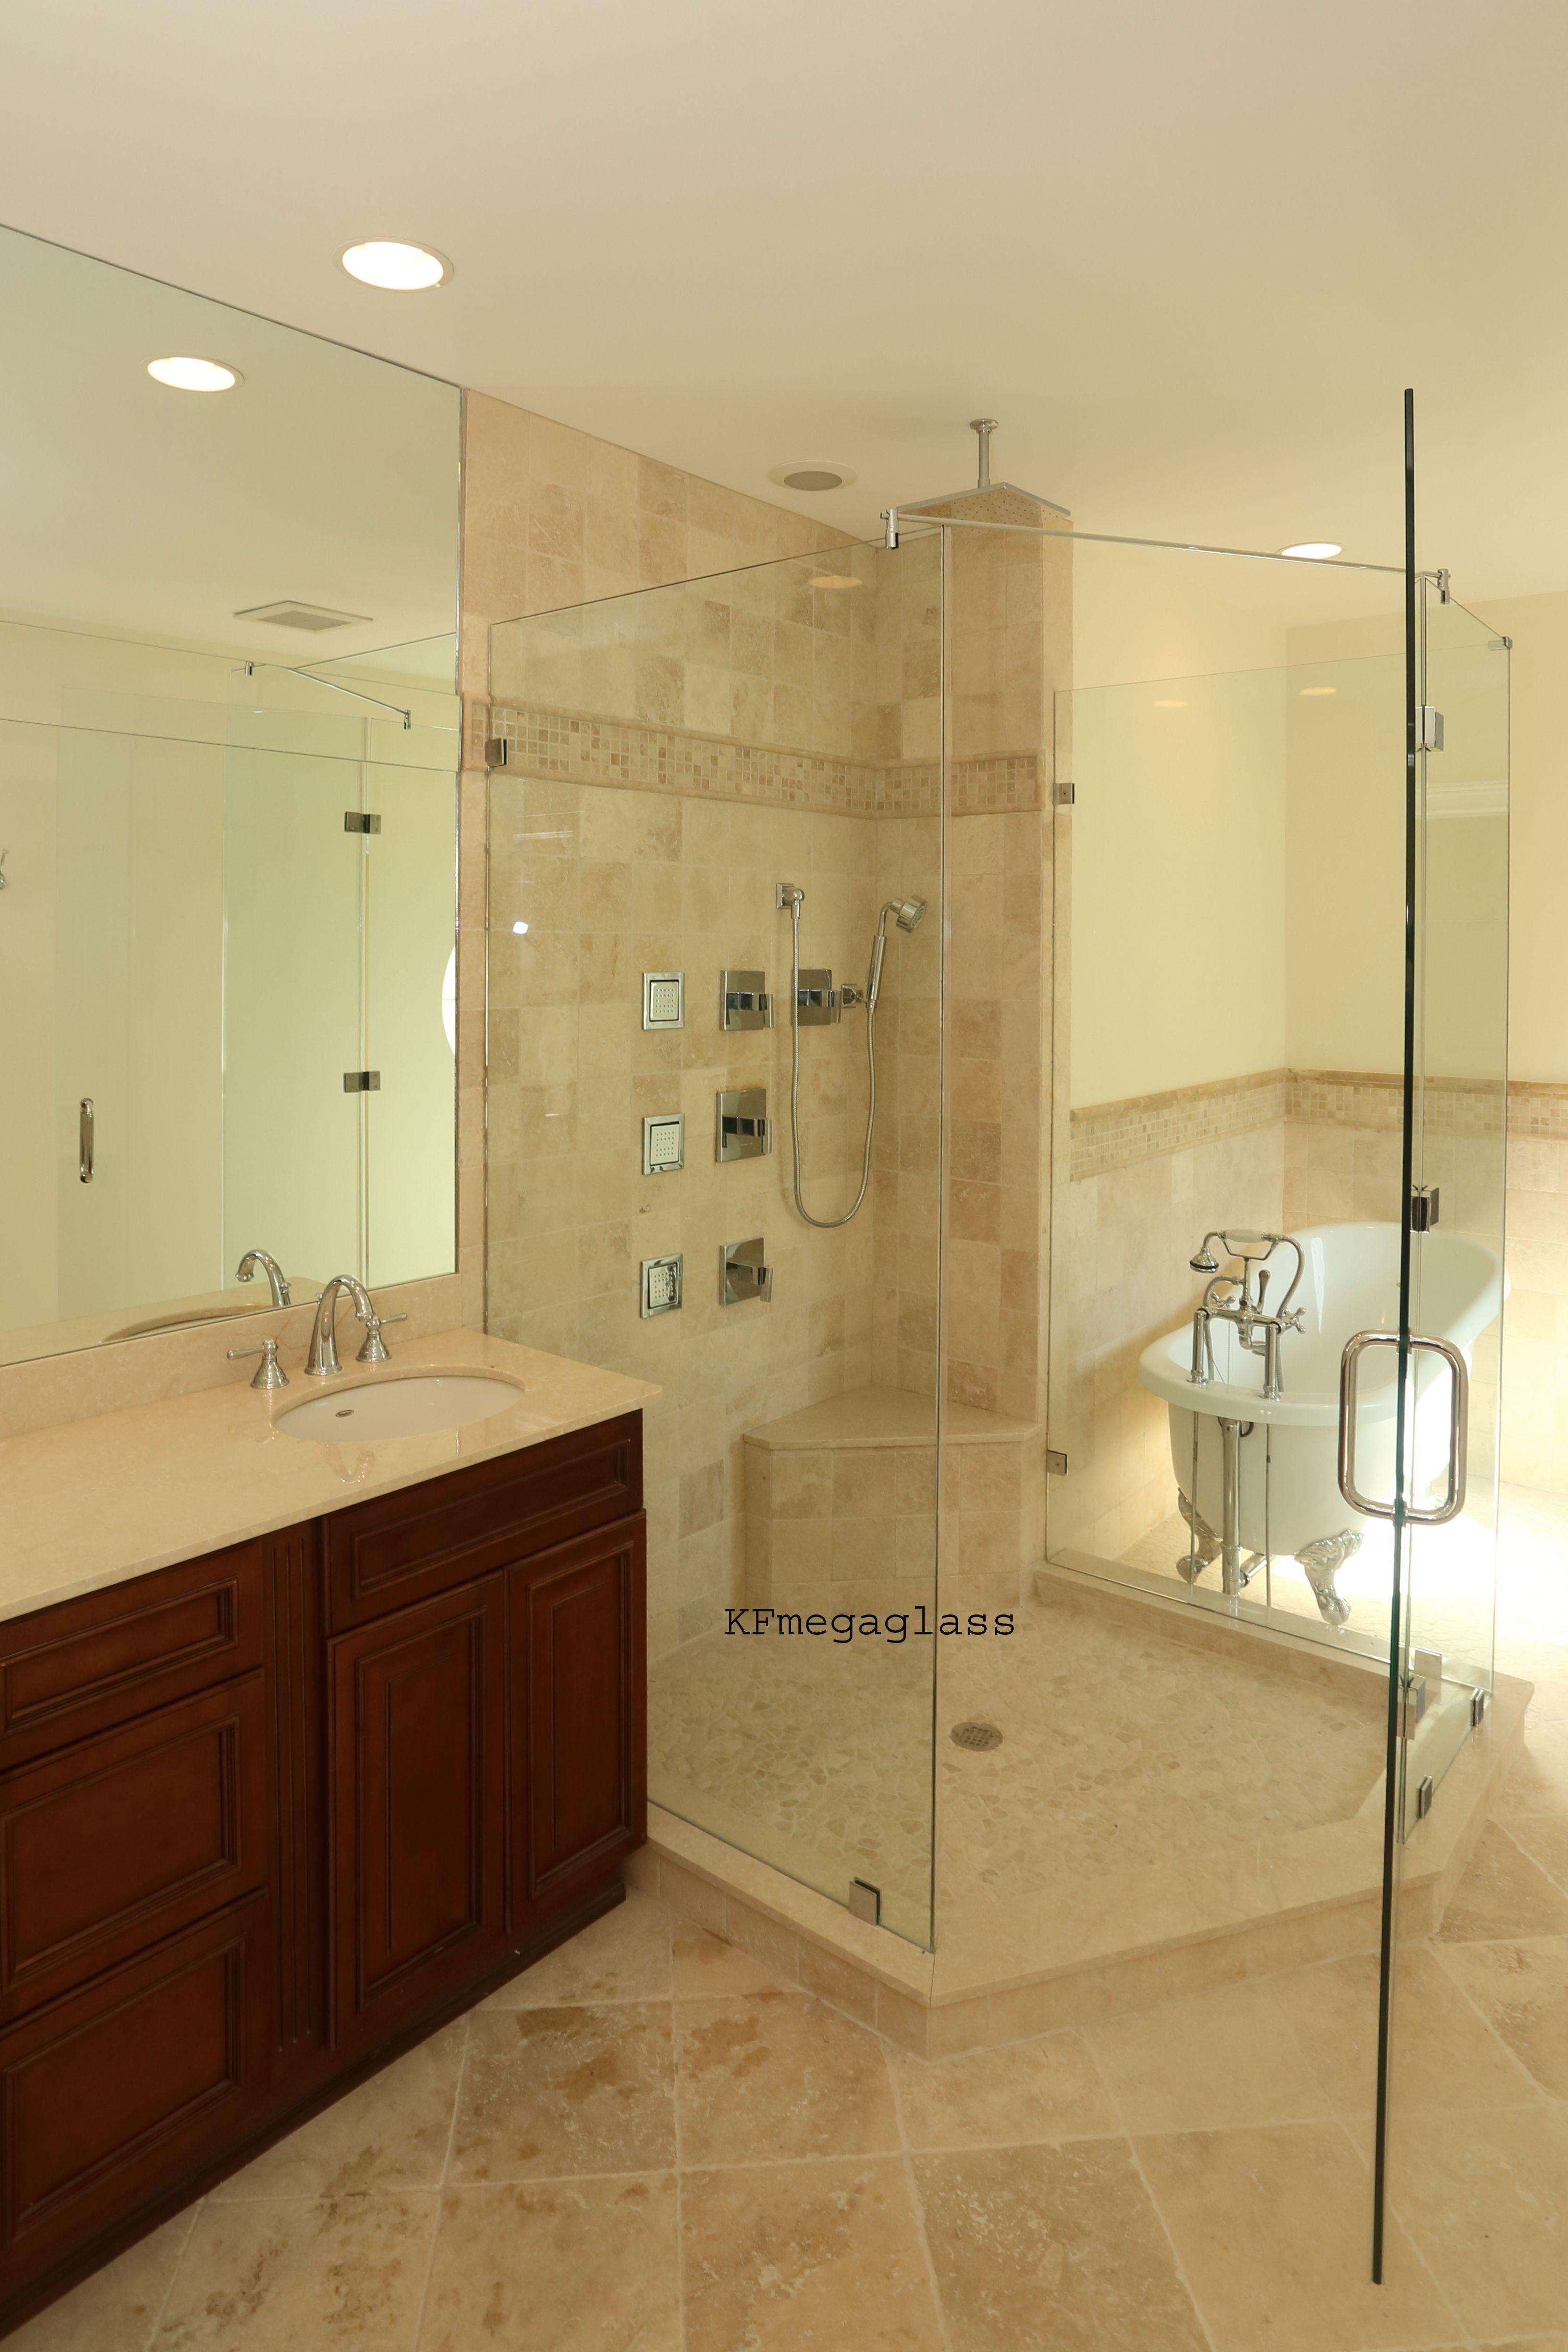 KFmegaglass is the premier company for design your New shower door ...